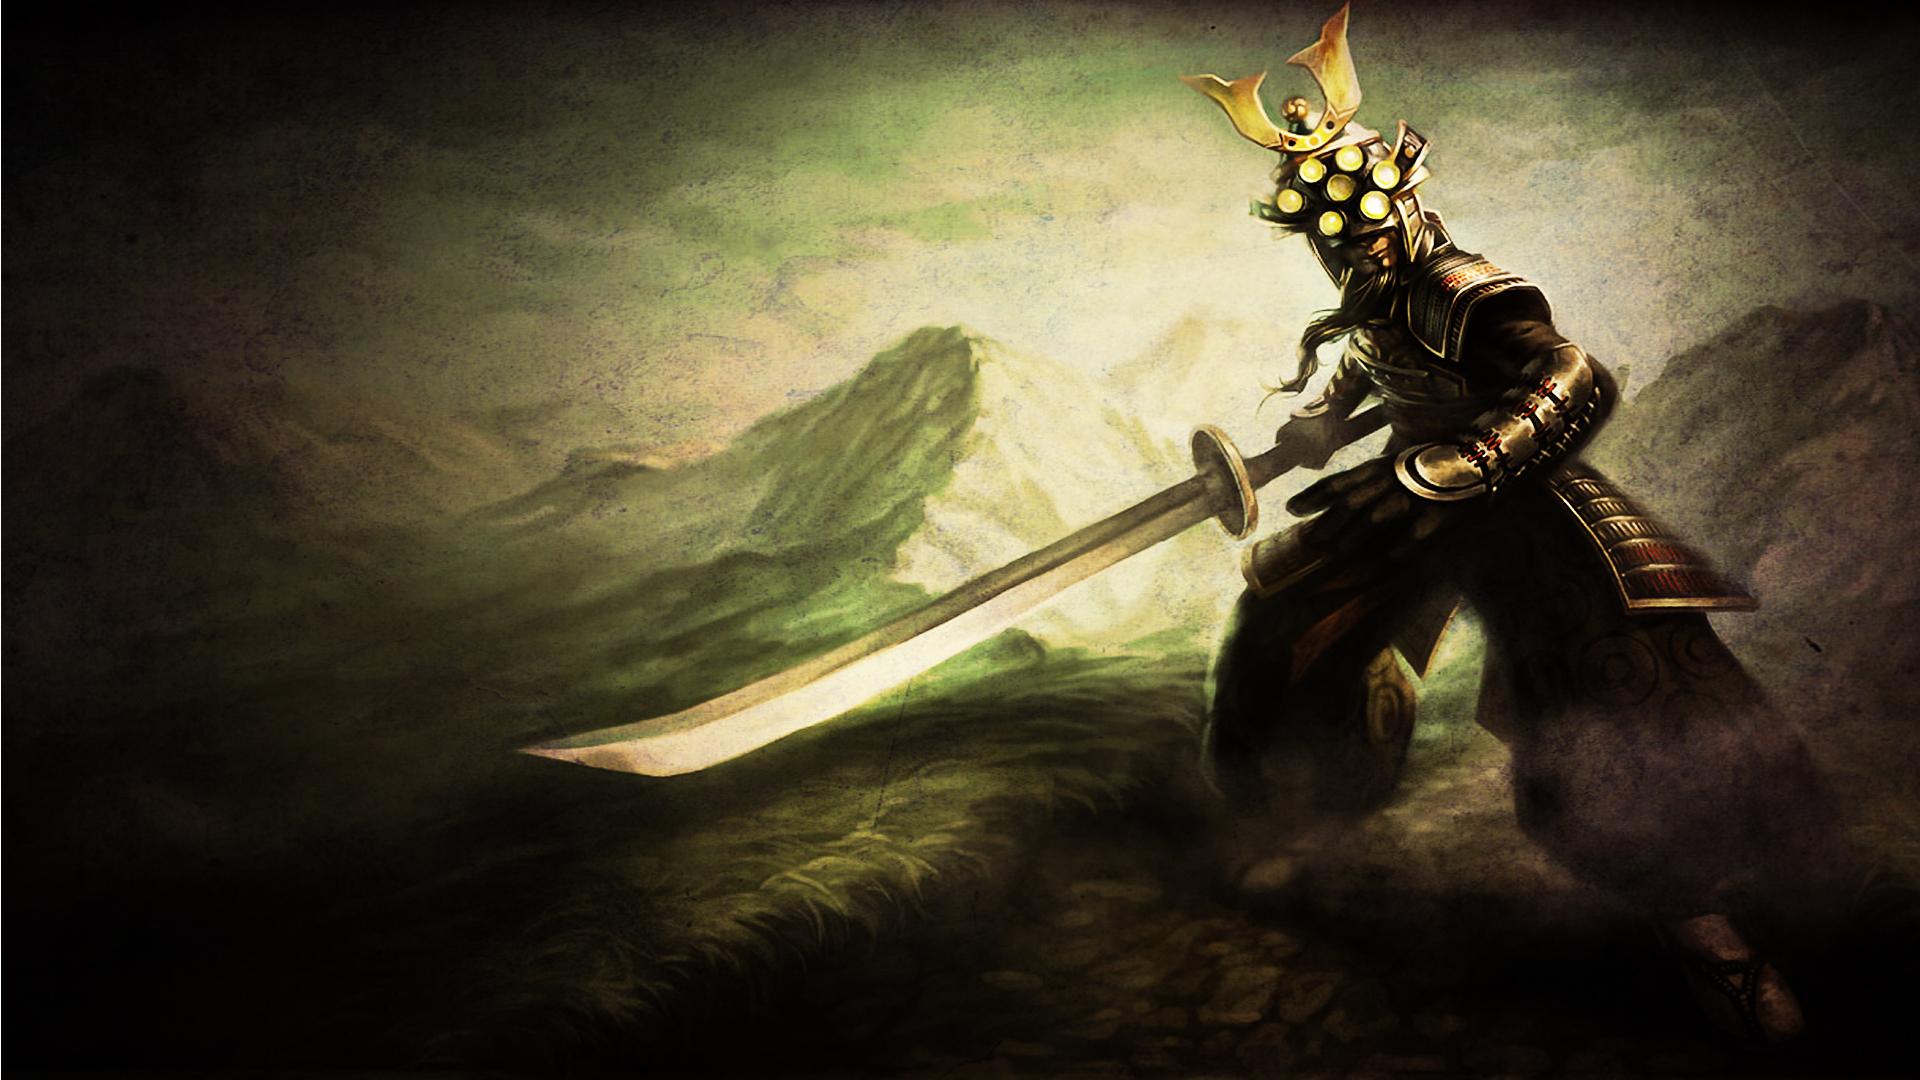 League Of Legends Master Yi Wallpaper By Soinnes On Deviantart